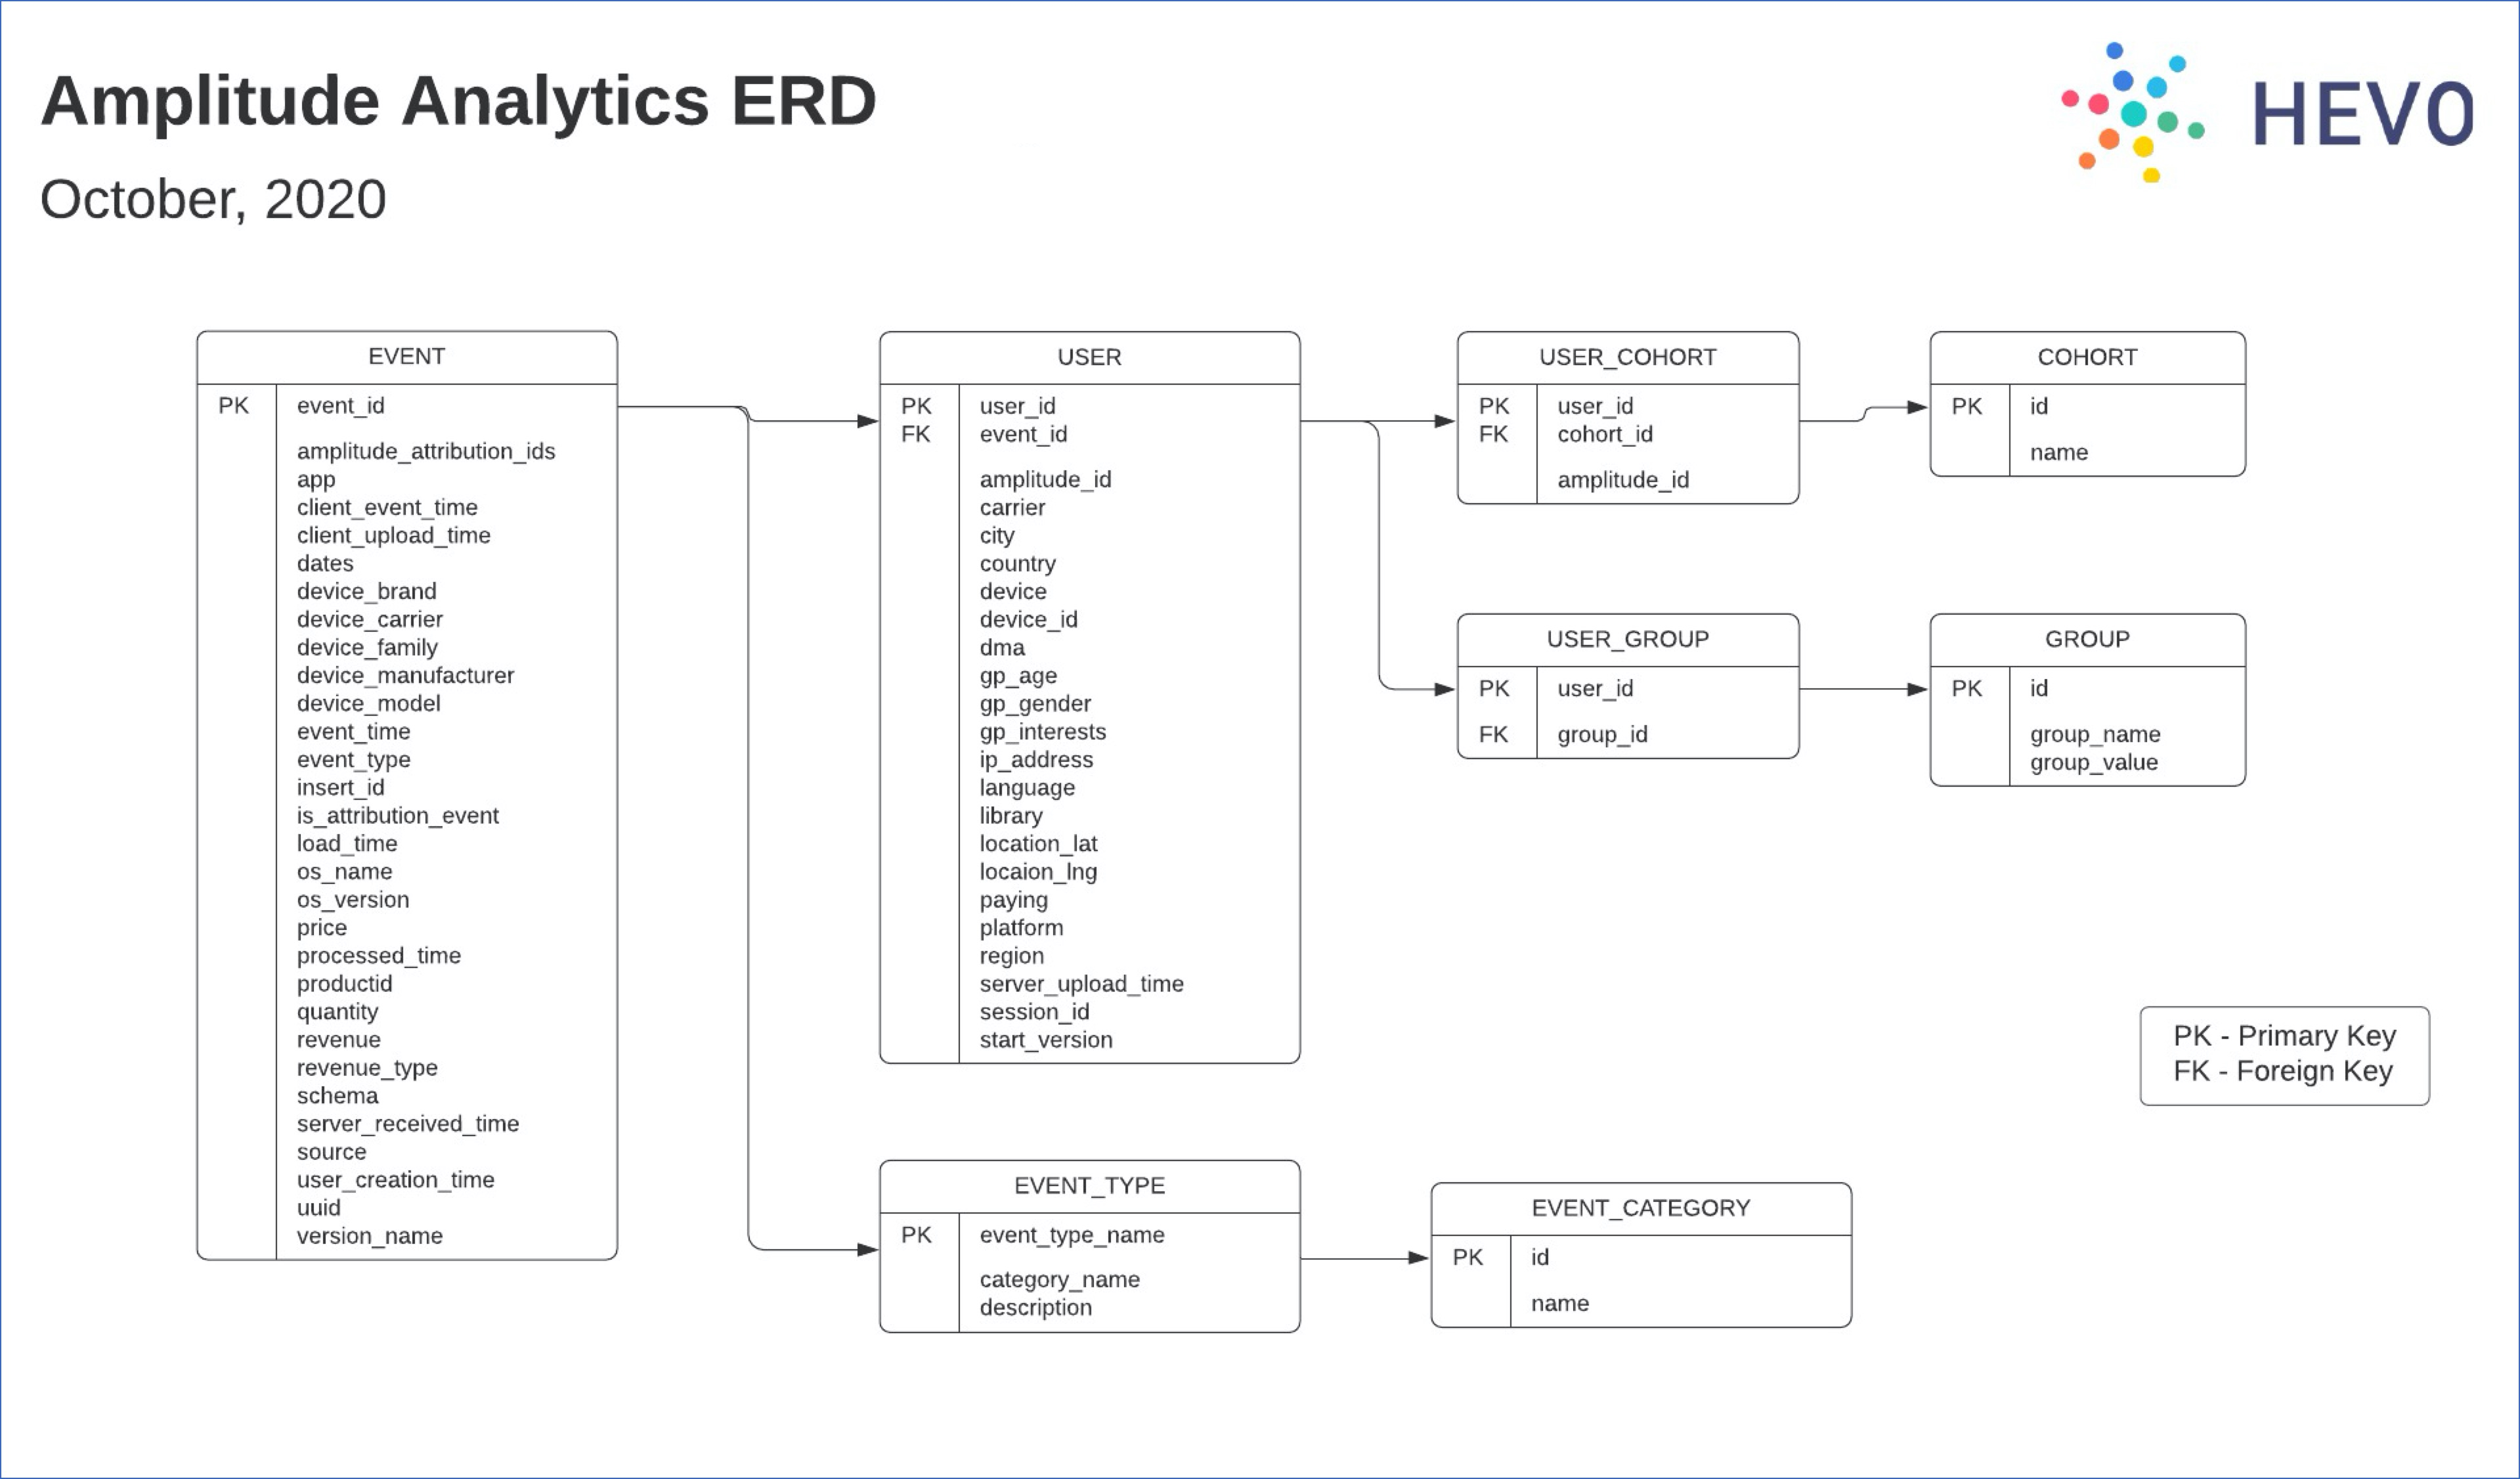 Amplitude Analytics ERD